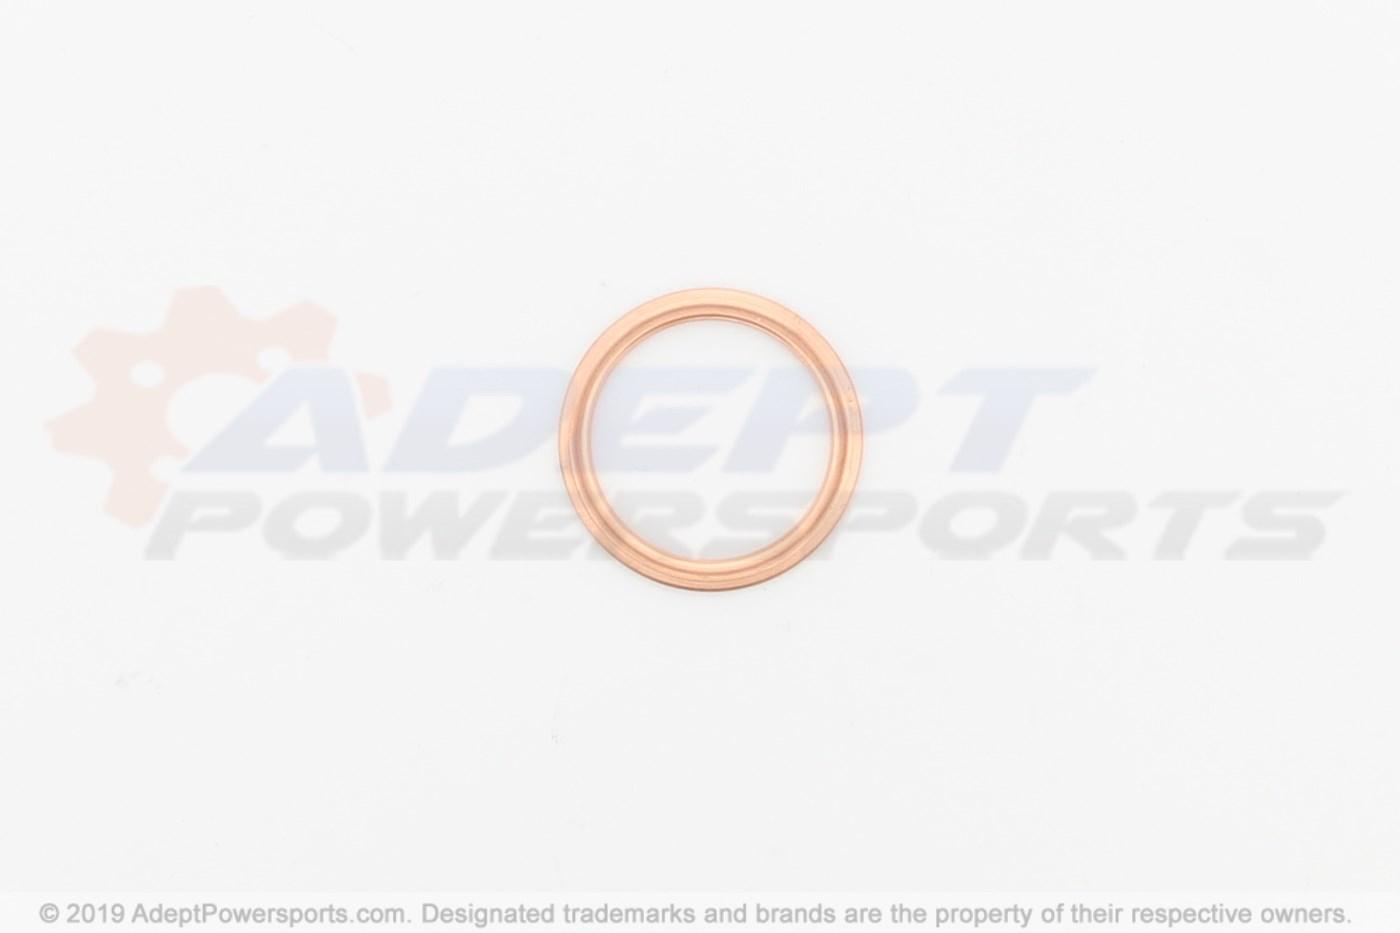 11009-1866 Kawasaki Gasket, Exhaust Pipe Holder $4.16